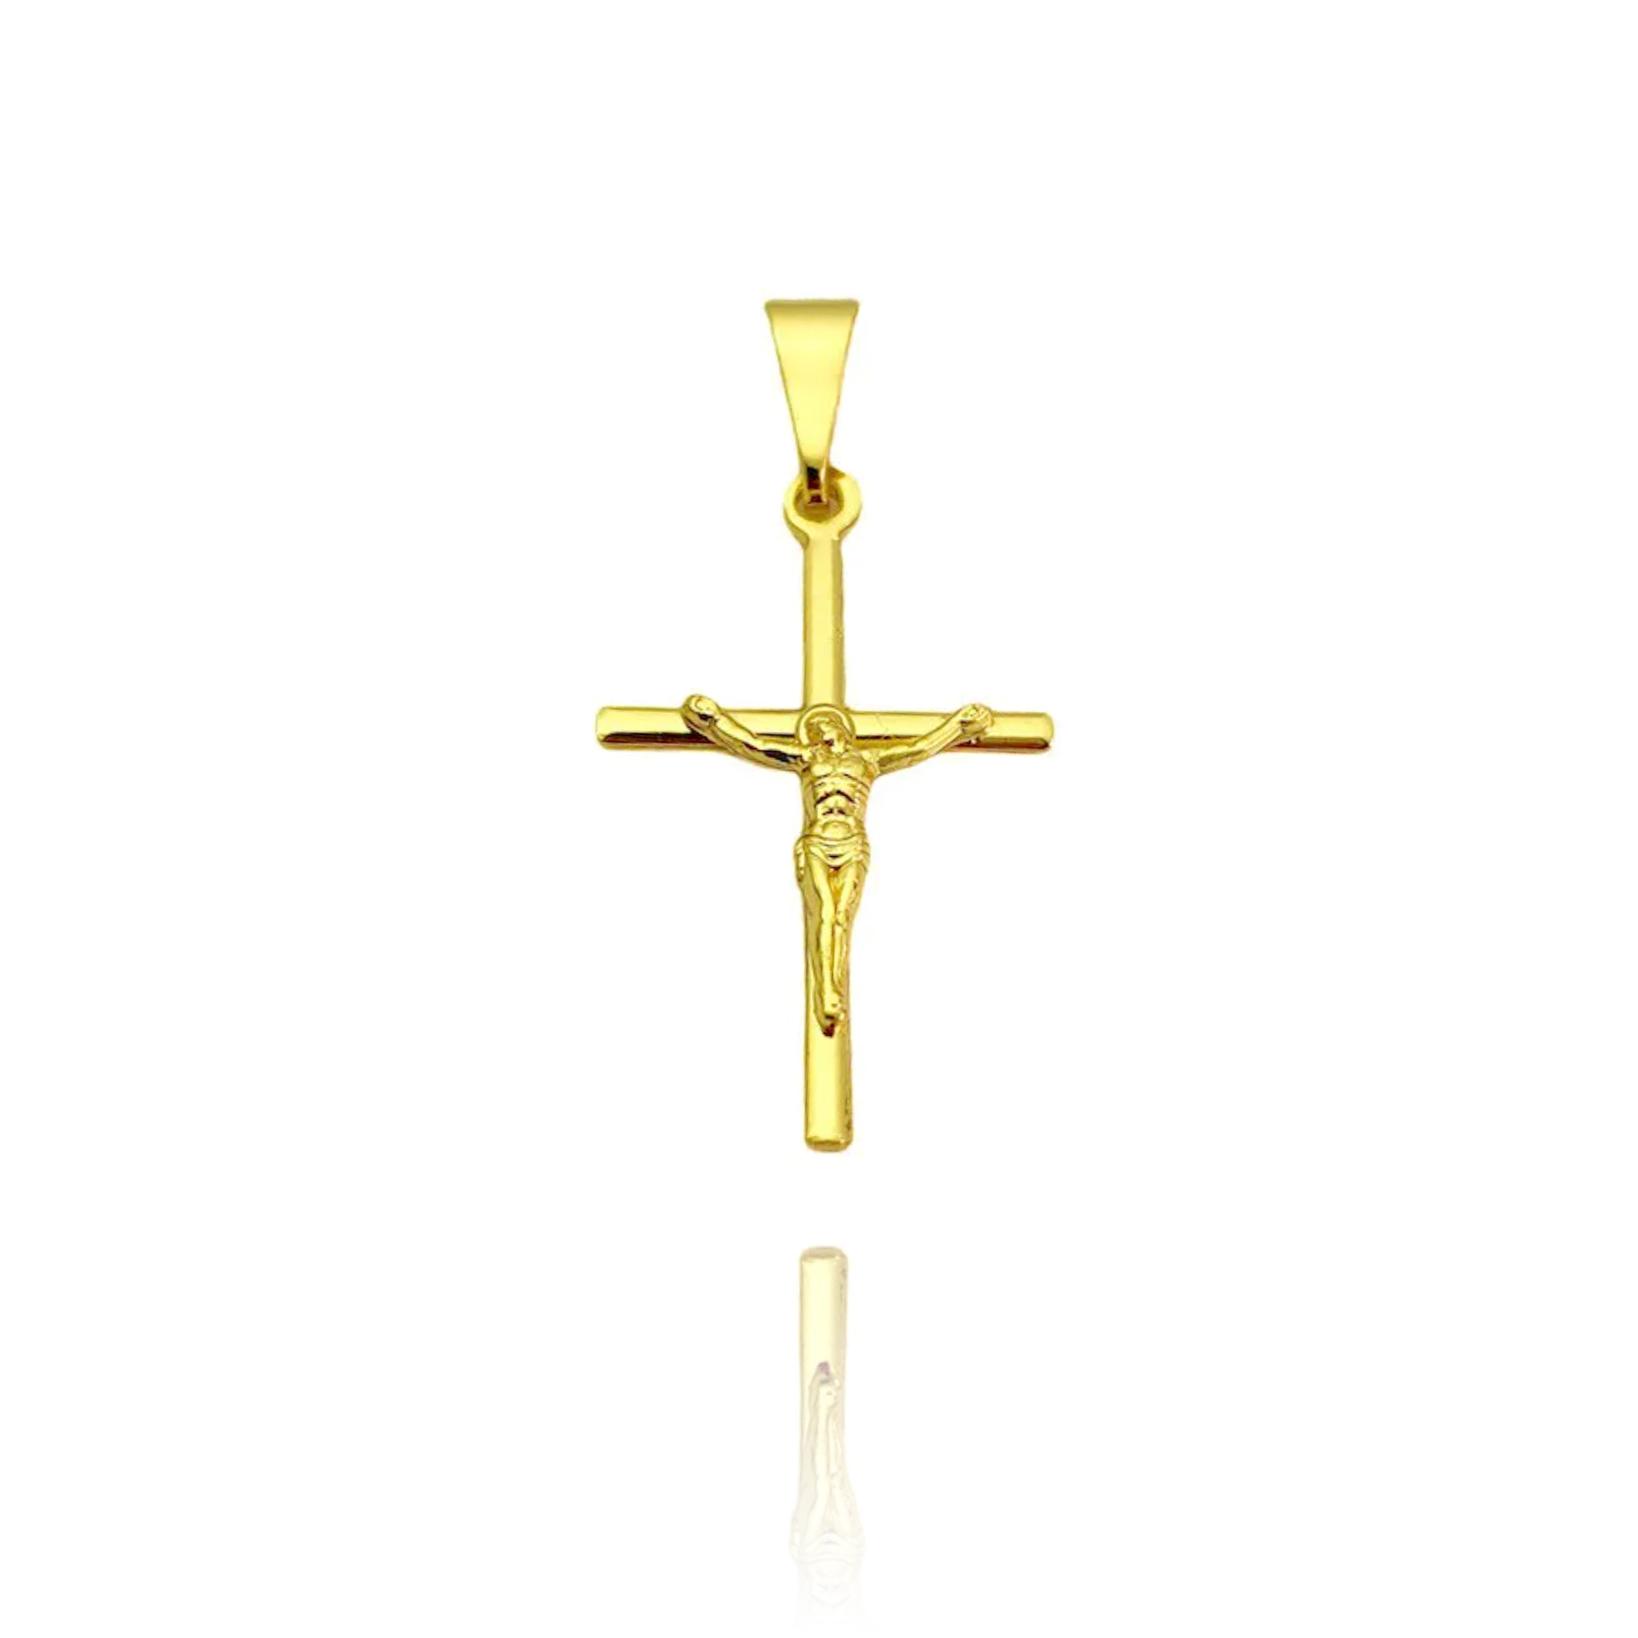 Pingente Crucifixo Cristo Relevo (2,5cmX1,6cm) (Banho Ouro 24k)